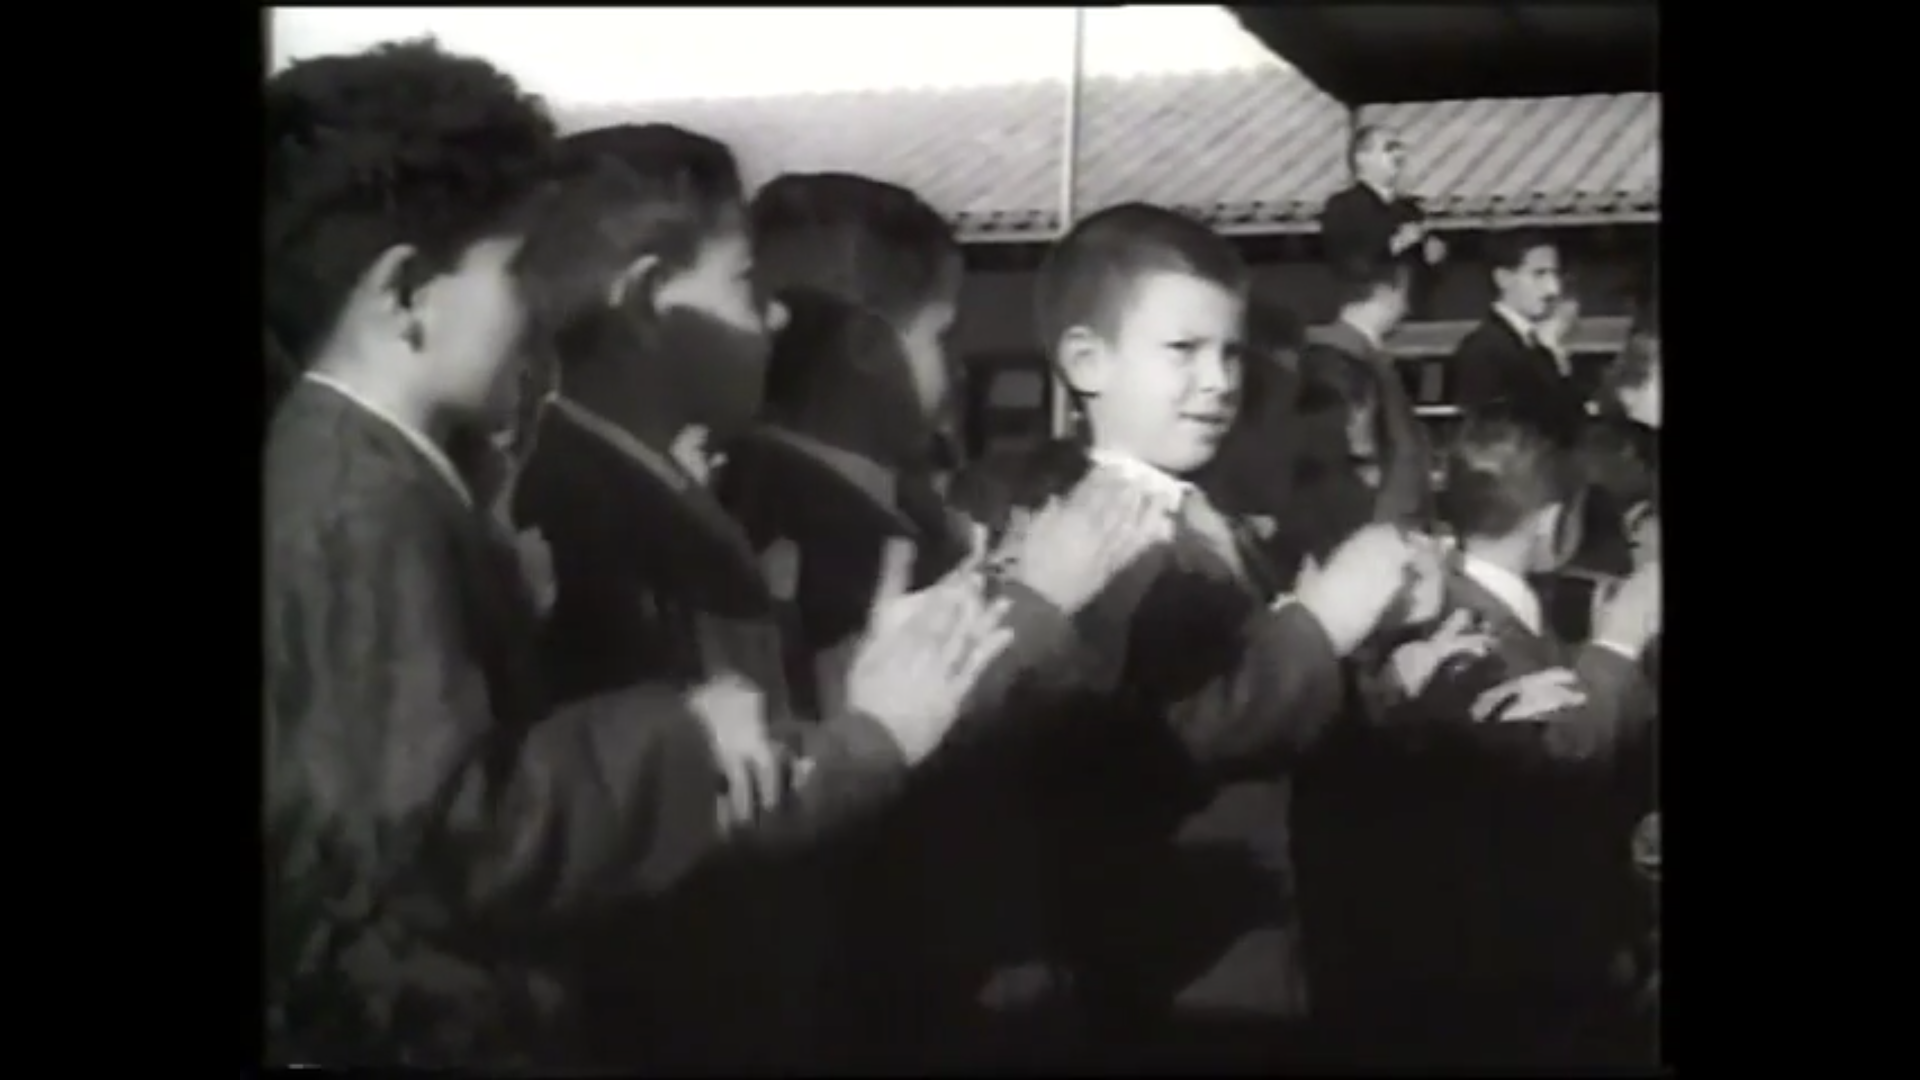 c.1950_(Escuela_Hogar_Eva_Perón)3